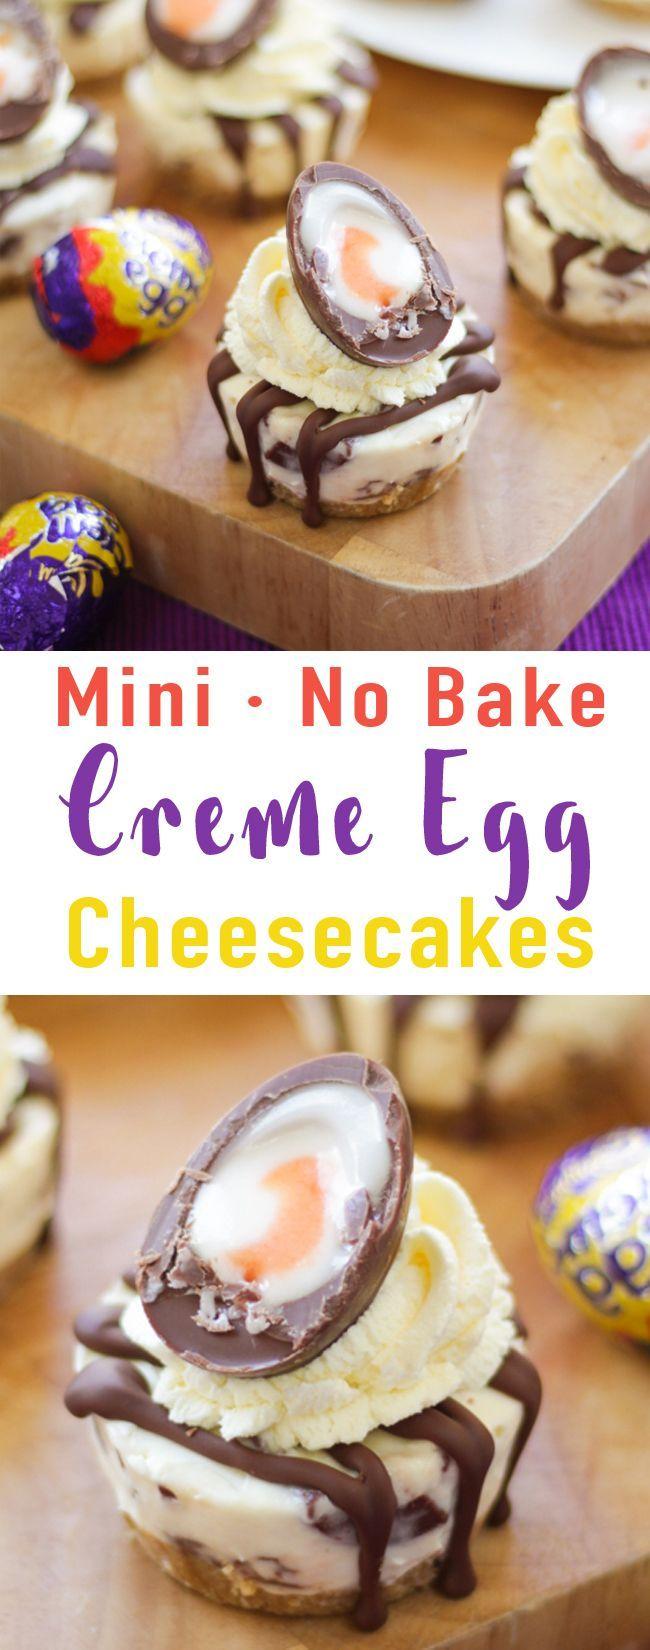 Mini No Bake Cream Egg Cheesecake Recipe – Delicious Light and Creamy No Bake Ea ….  – Dessert